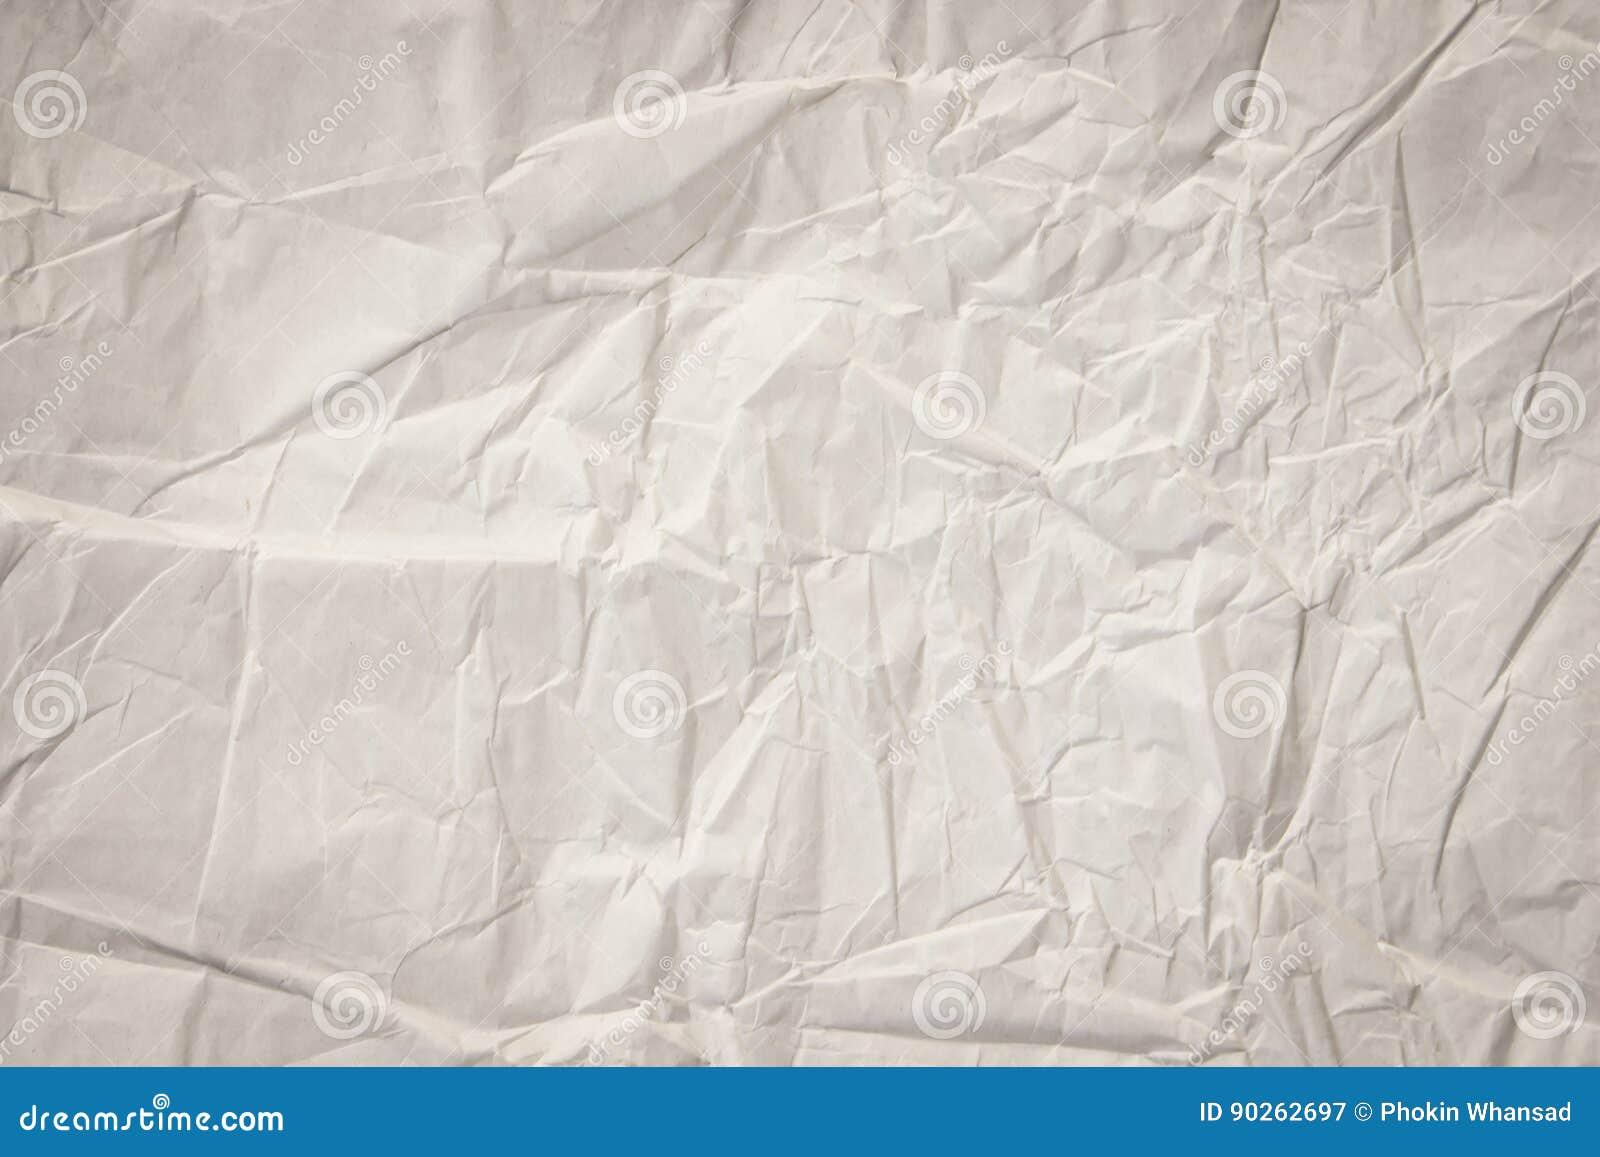 Feche acima da folha brilhante do papel da textura do enrugamento a luz tonificou a arte